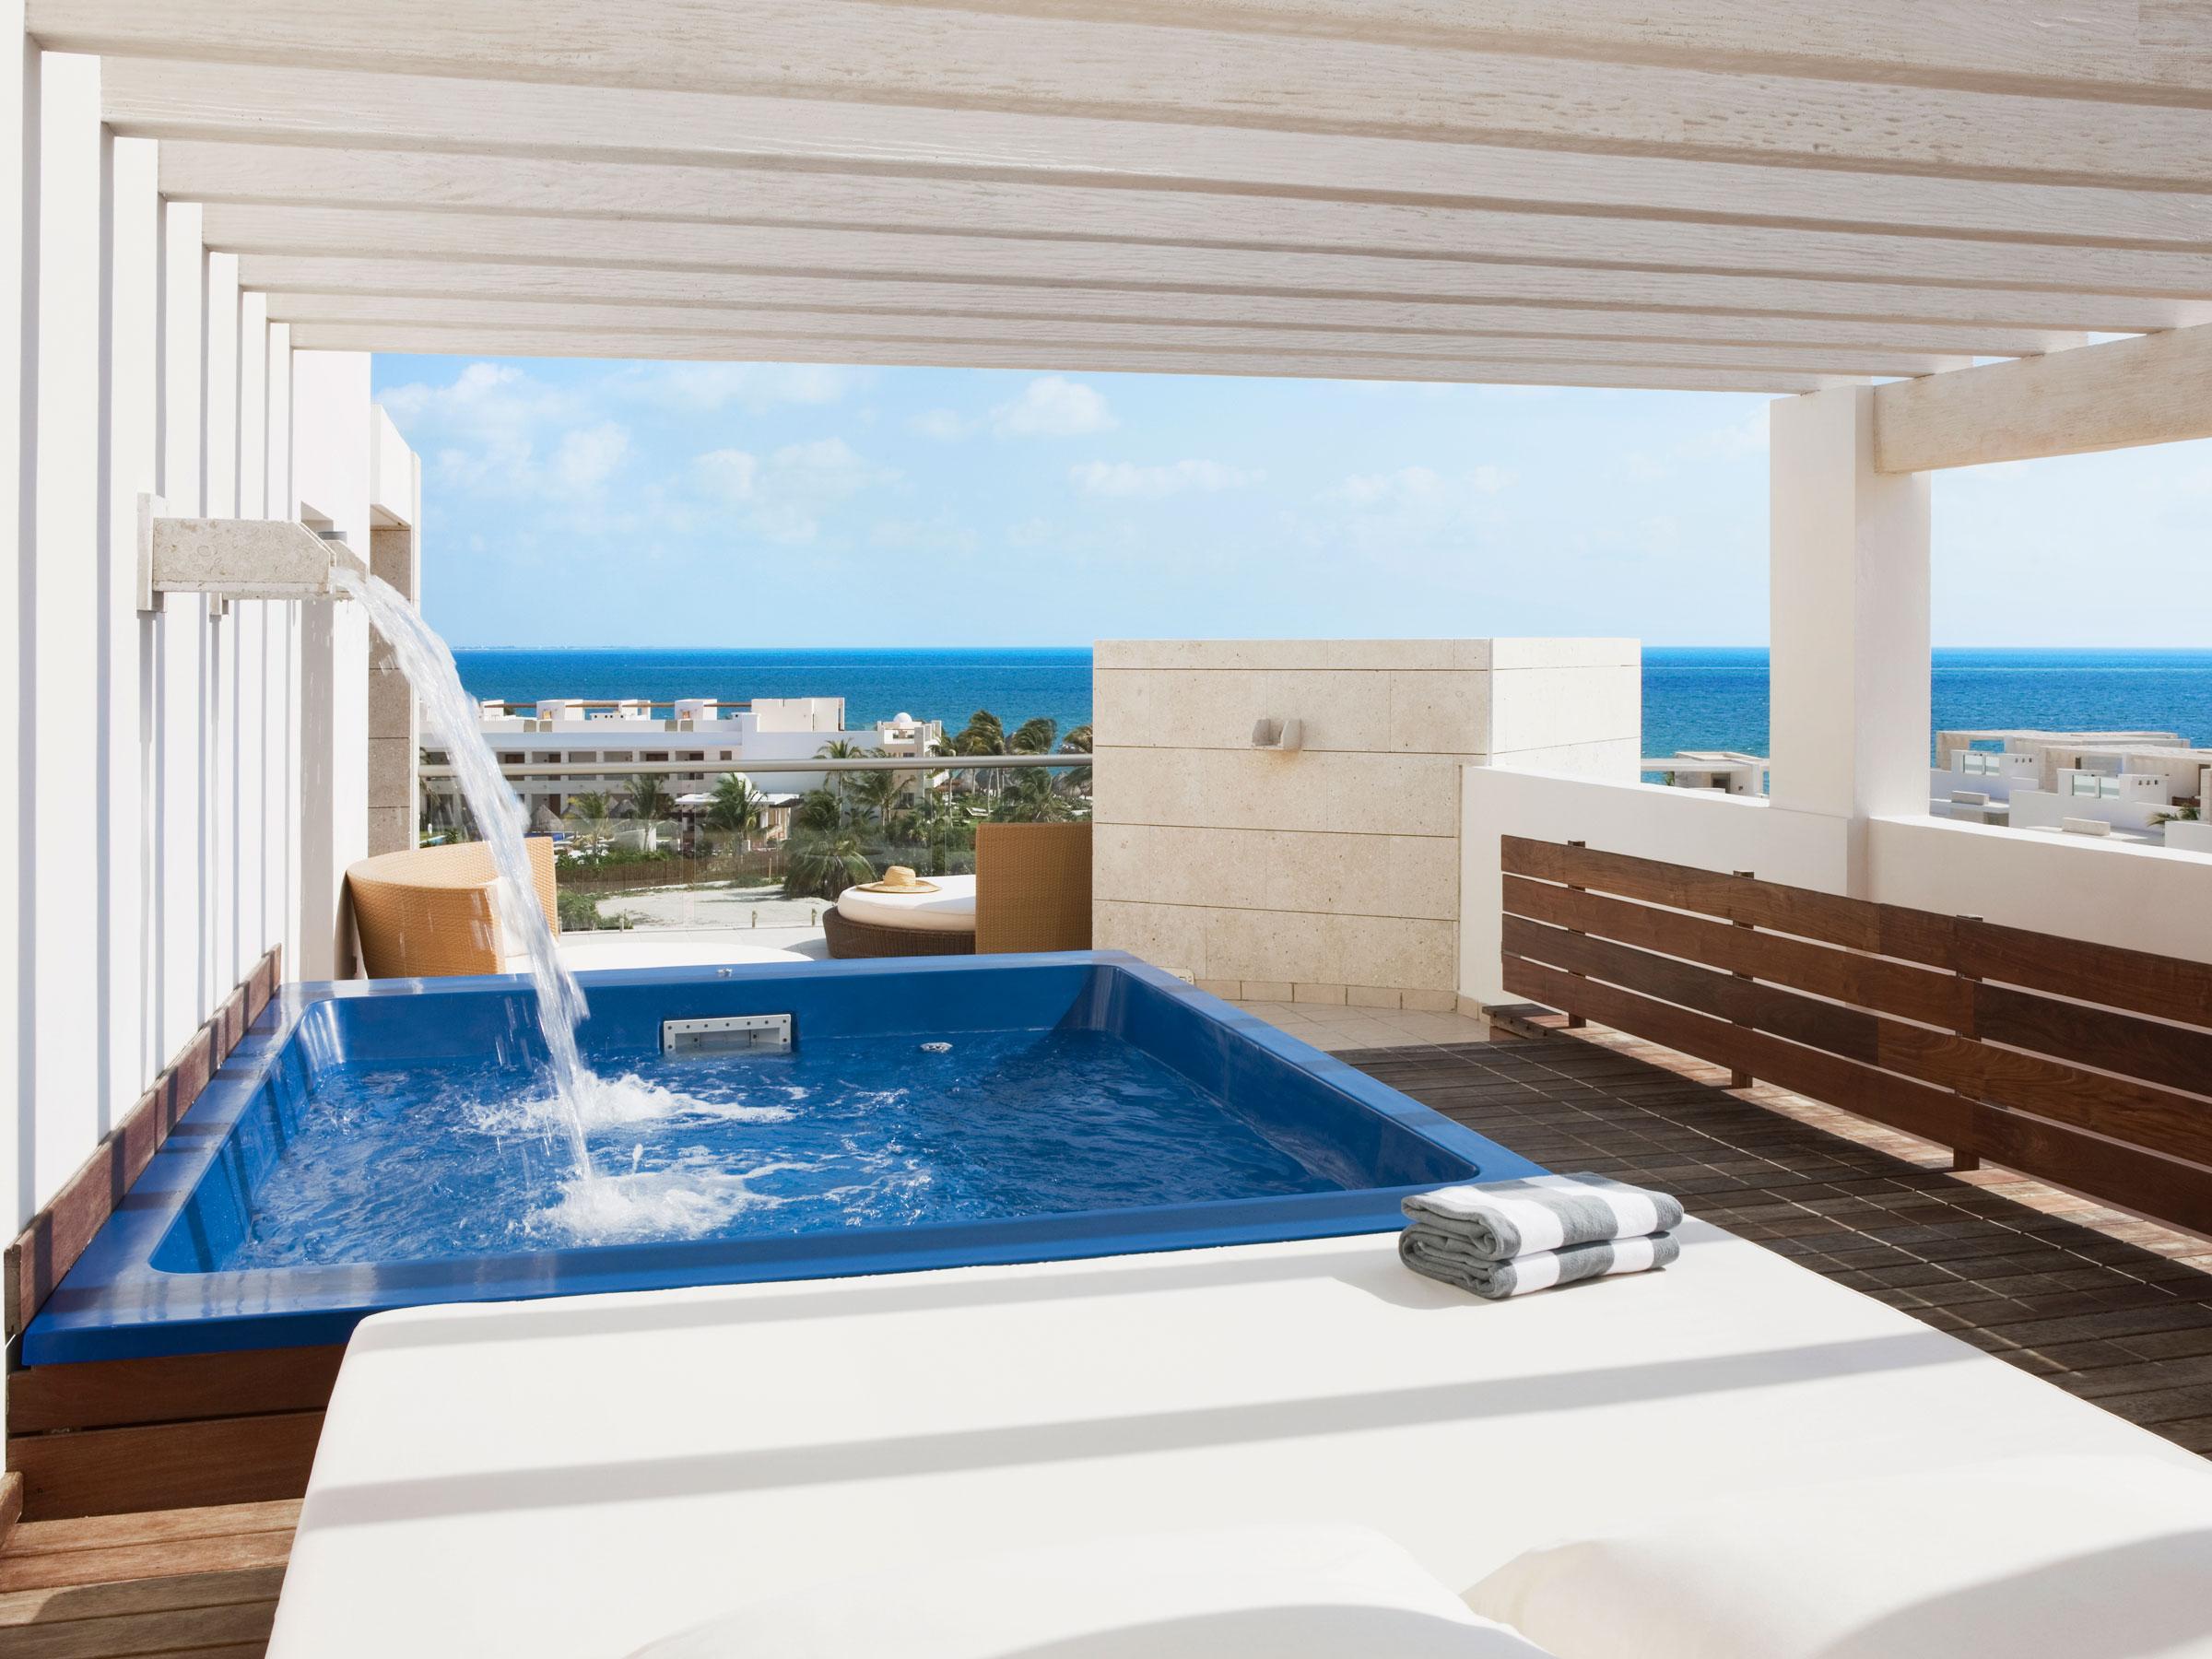 Suite Avec Terrasse Et Bassin De Plongeon | Suites | Beloved ... destiné Terrasse Avec Piscine